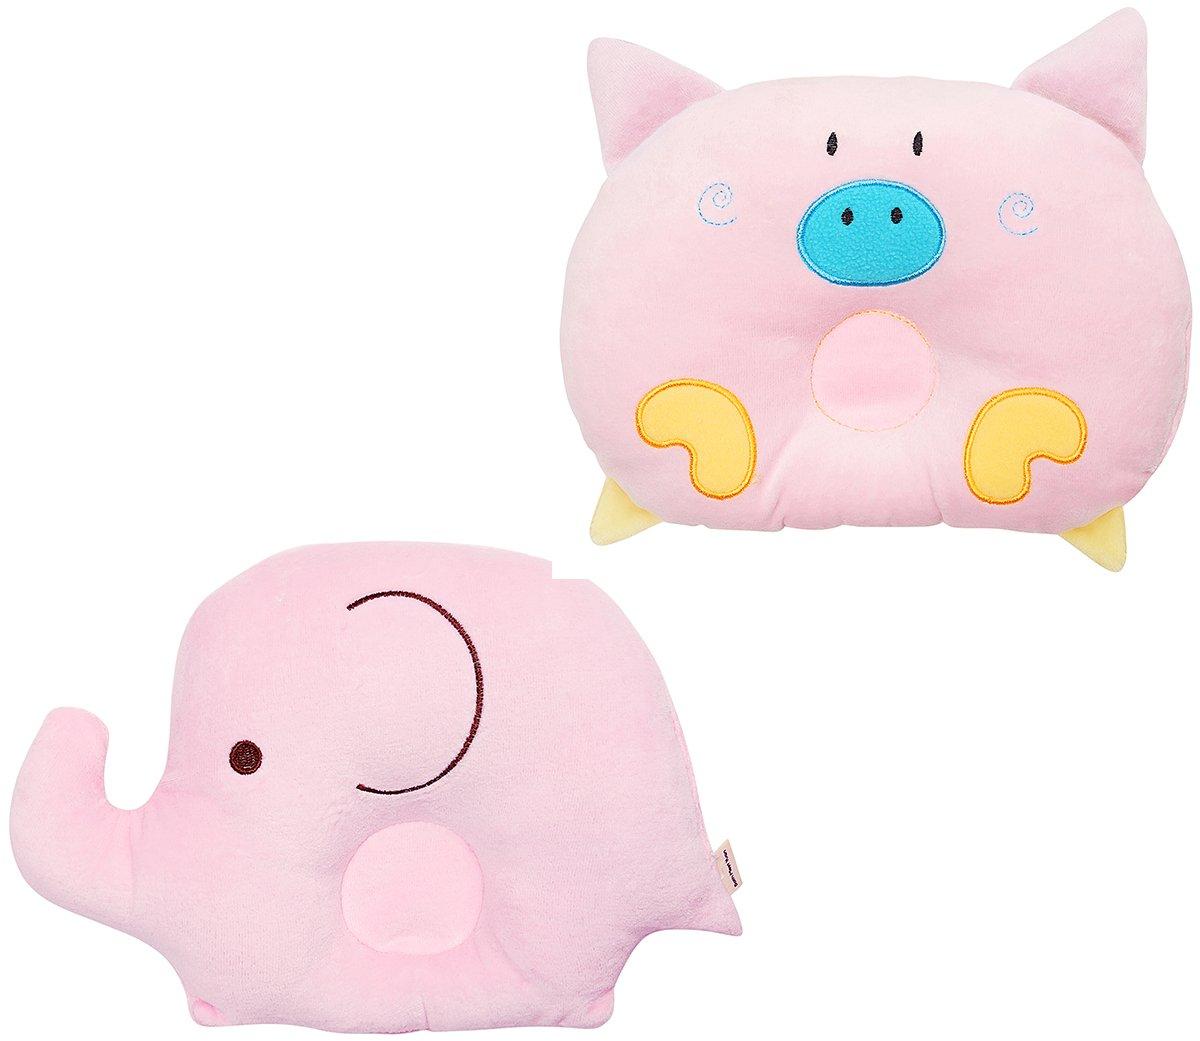 Baby Protective Pillow Elephant Porket Cartoon Design Toddler Head Pillow Both Meet Yuan